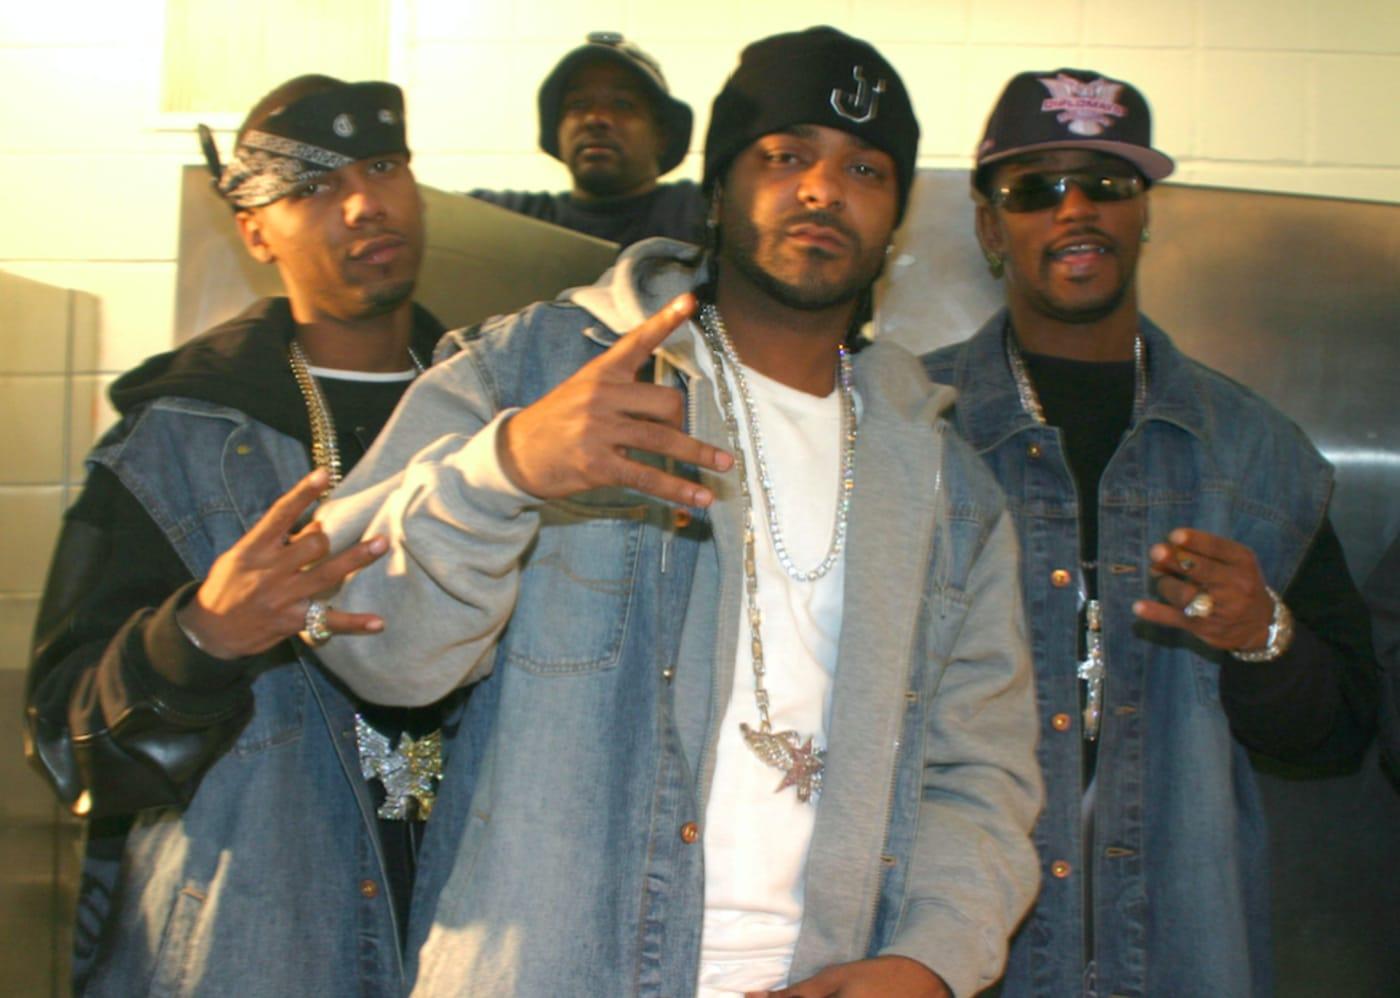 rapper mix tape dipset diplomats